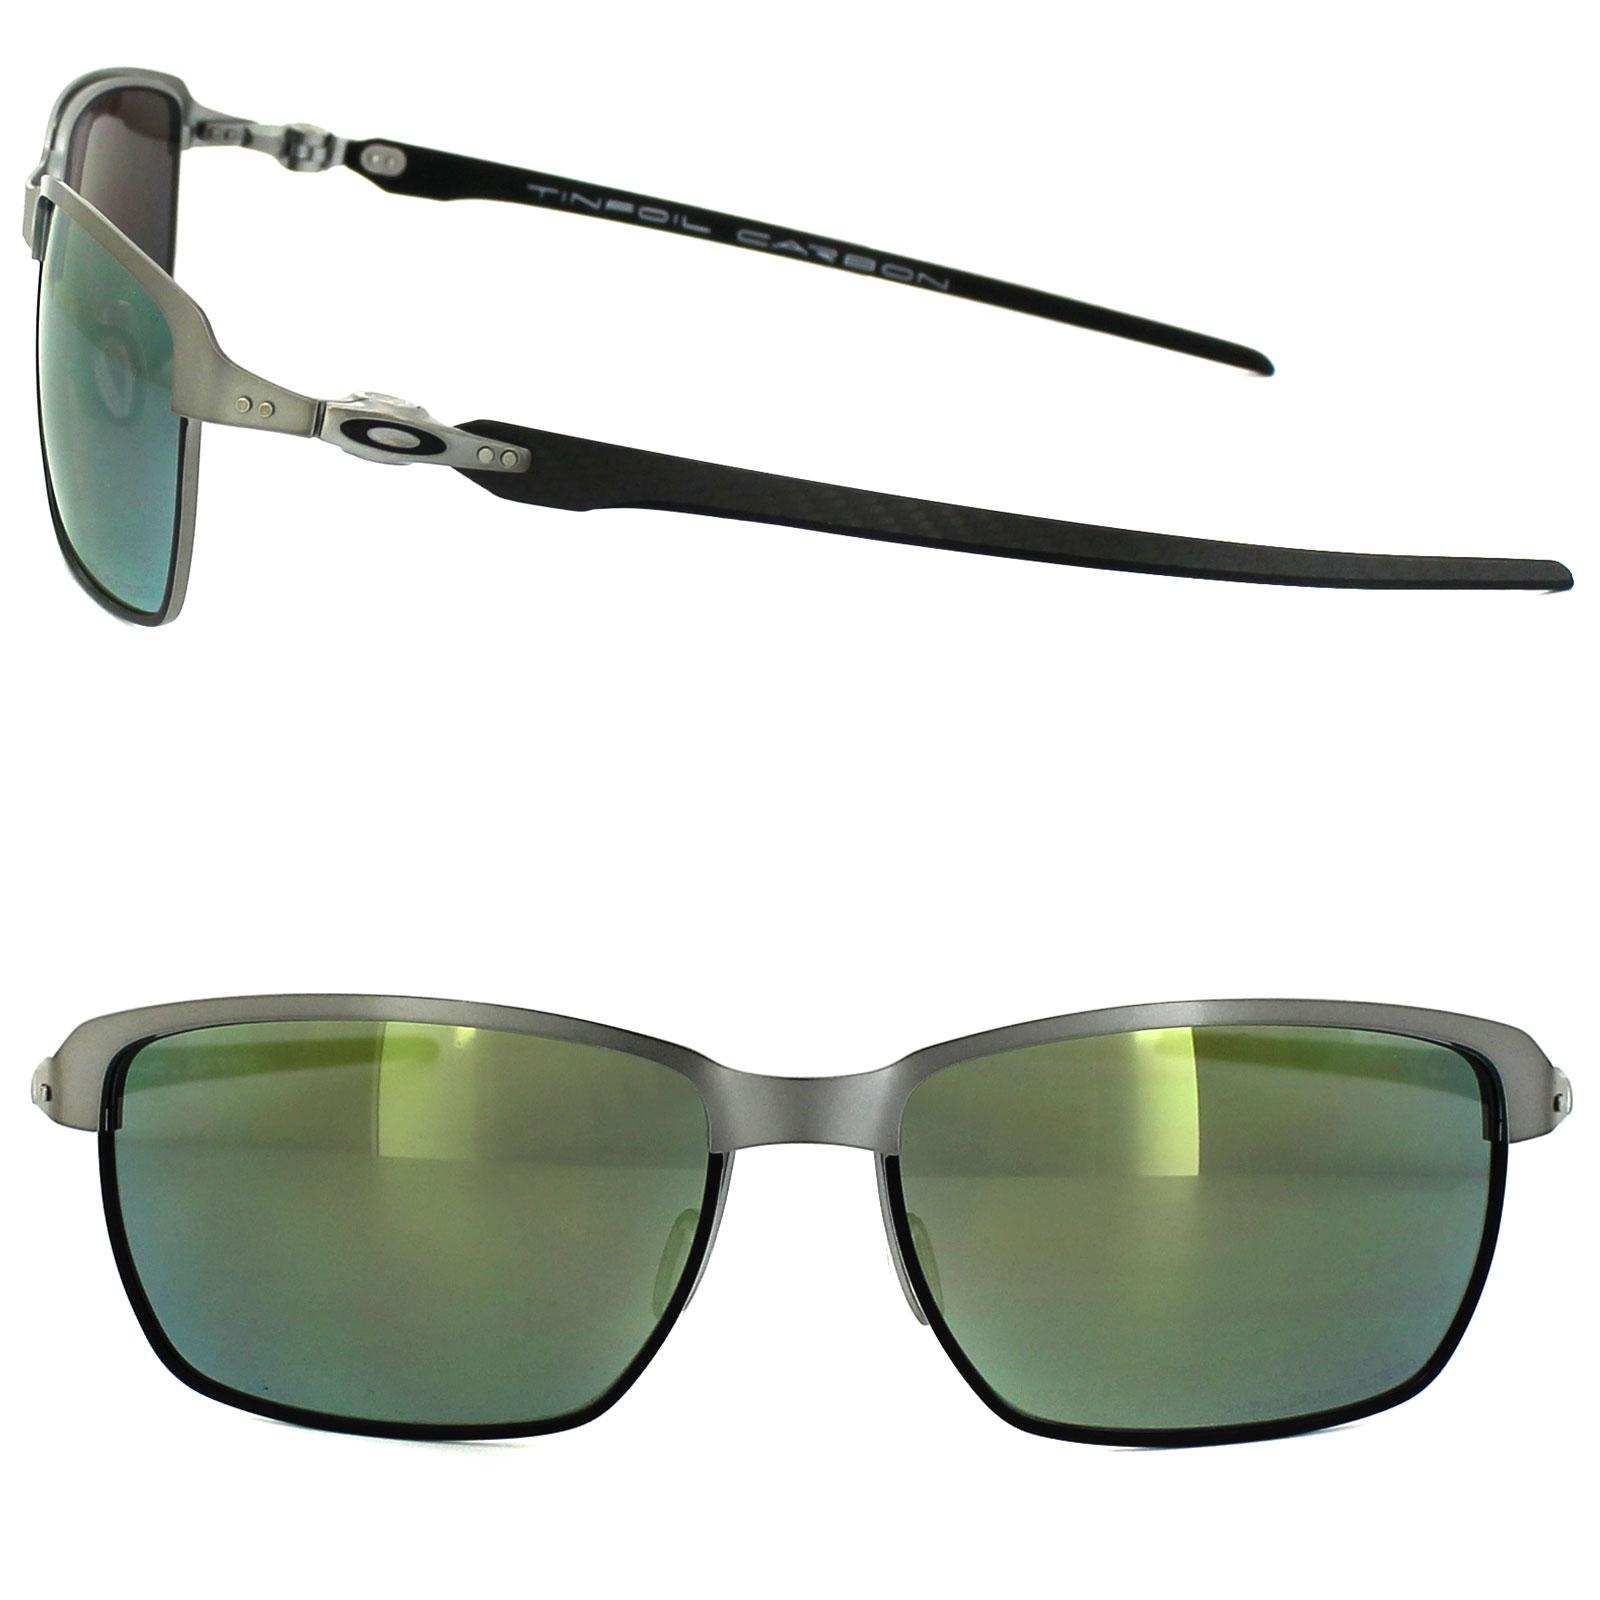 7b268e95ff Oakley Tinfoil Carbon Sunglasses Thumbnail 1 Oakley Tinfoil Carbon  Sunglasses Thumbnail 2